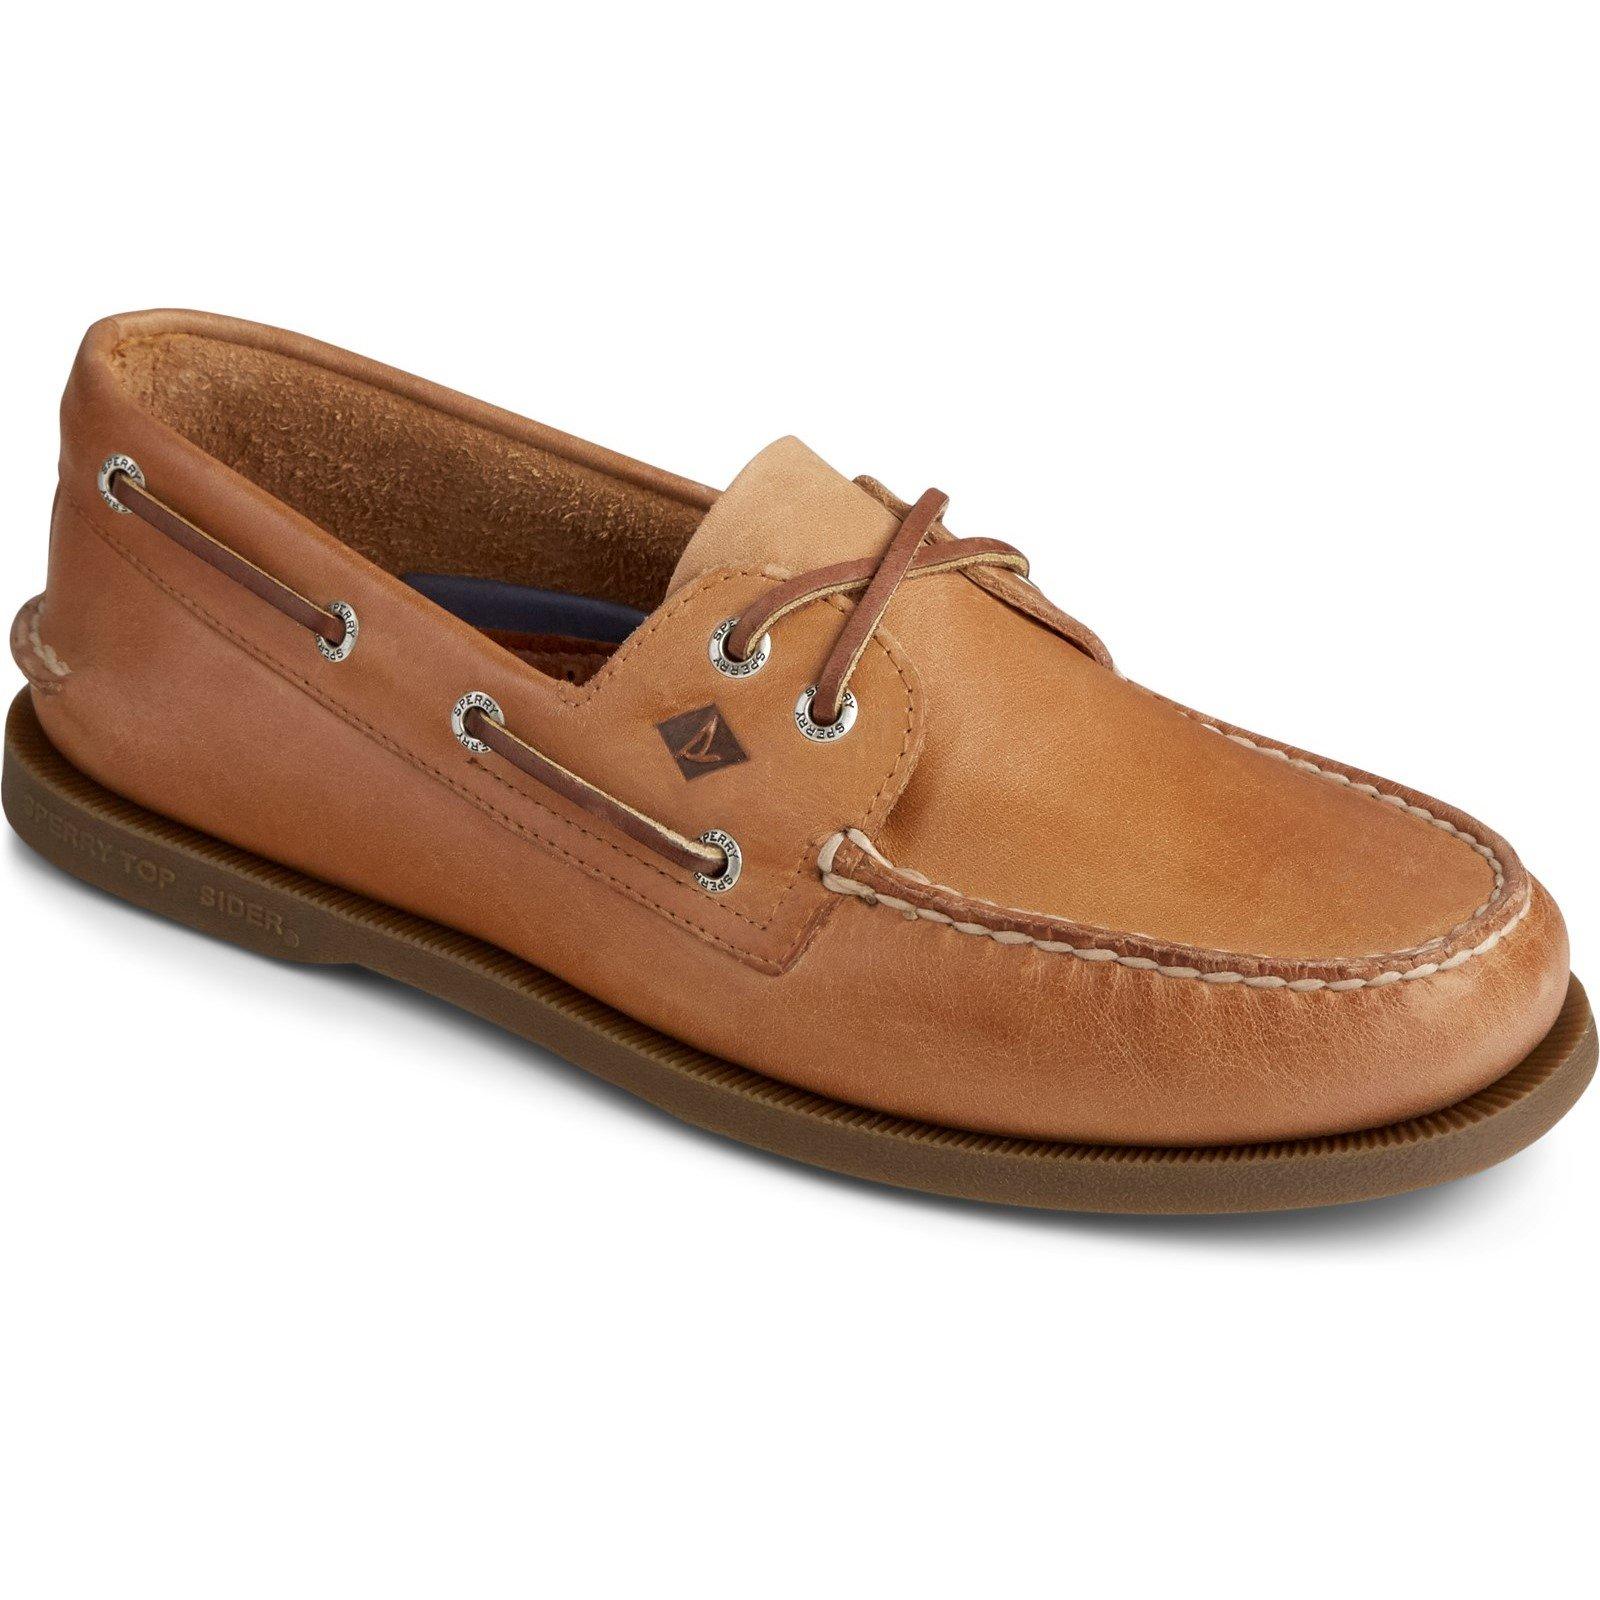 Sperry Men's Authentic Original Leather Boat Shoe Various Colours 31524 - Nutmeg 12